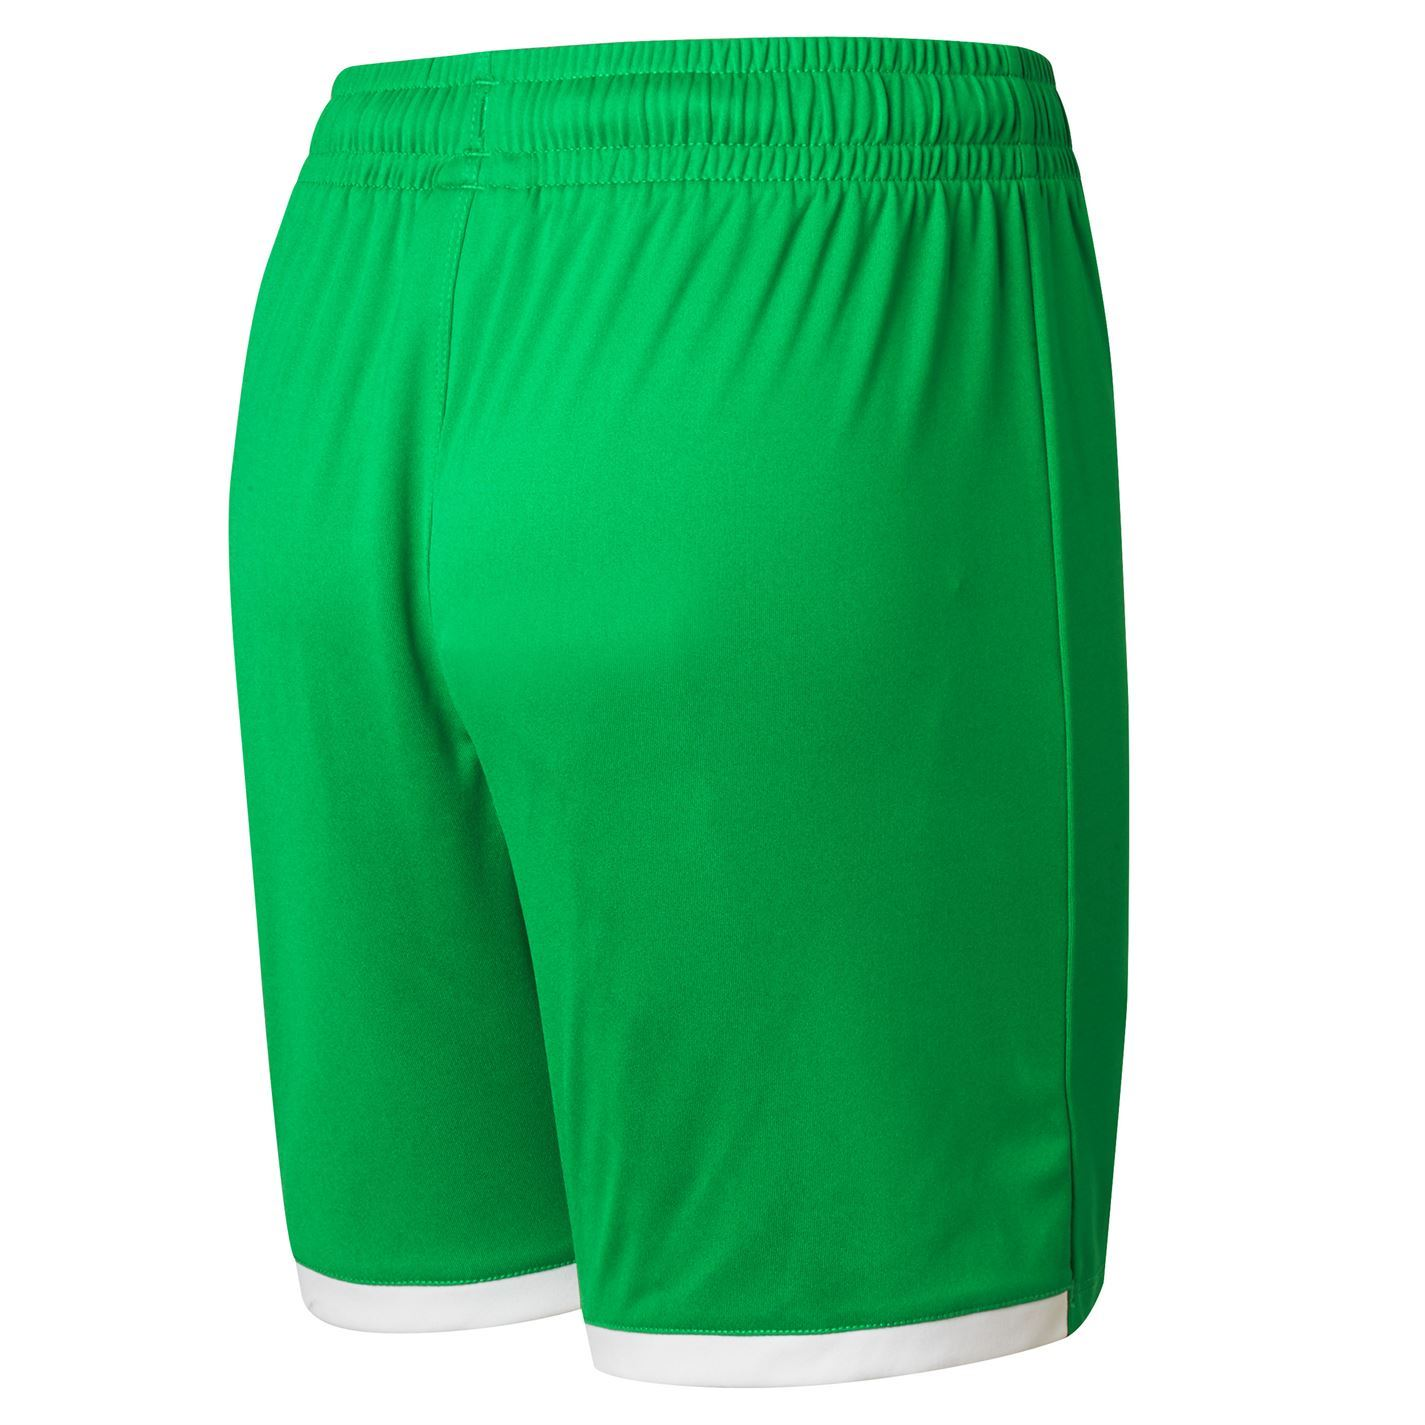 e205a71b4 ... New Balance Liverpool Home Goalkeeper Shorts 2017-18 Mens Green Football  Soccer